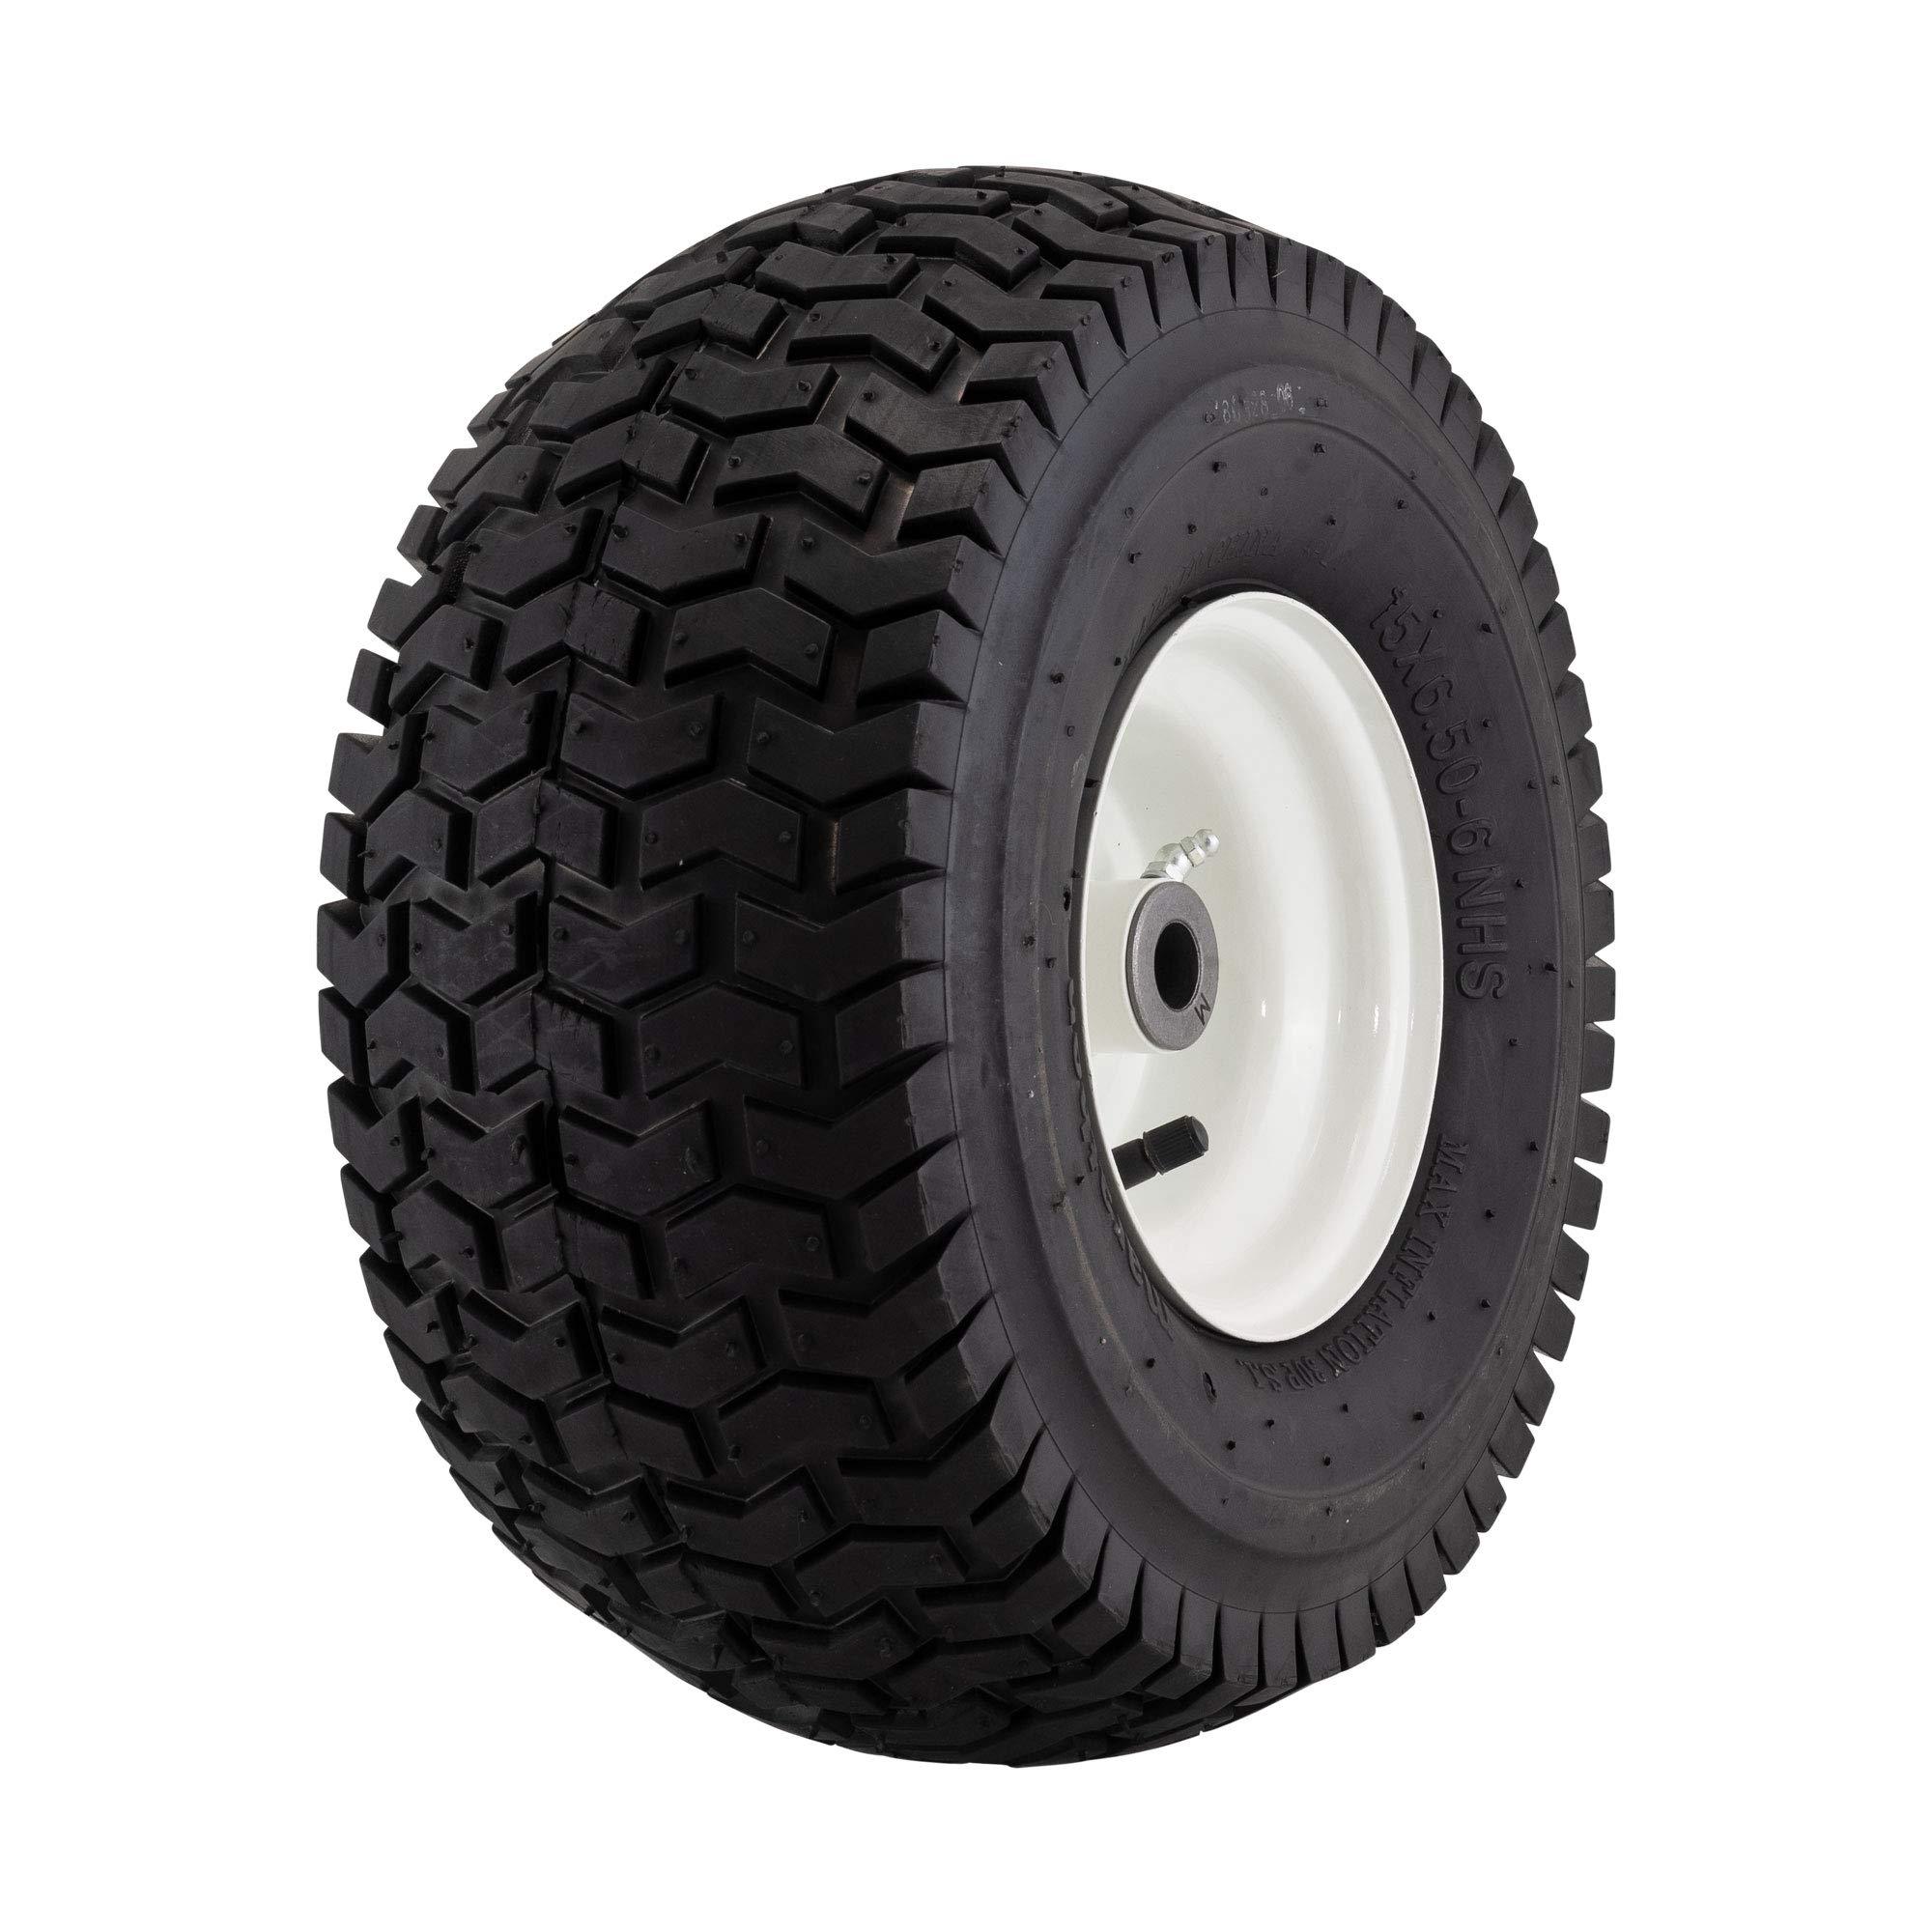 Marathon 15x6.50-6'' Pneumatic (Air Filled) Tire on Wheel, 3'' Hub, 3/4'' Bushing